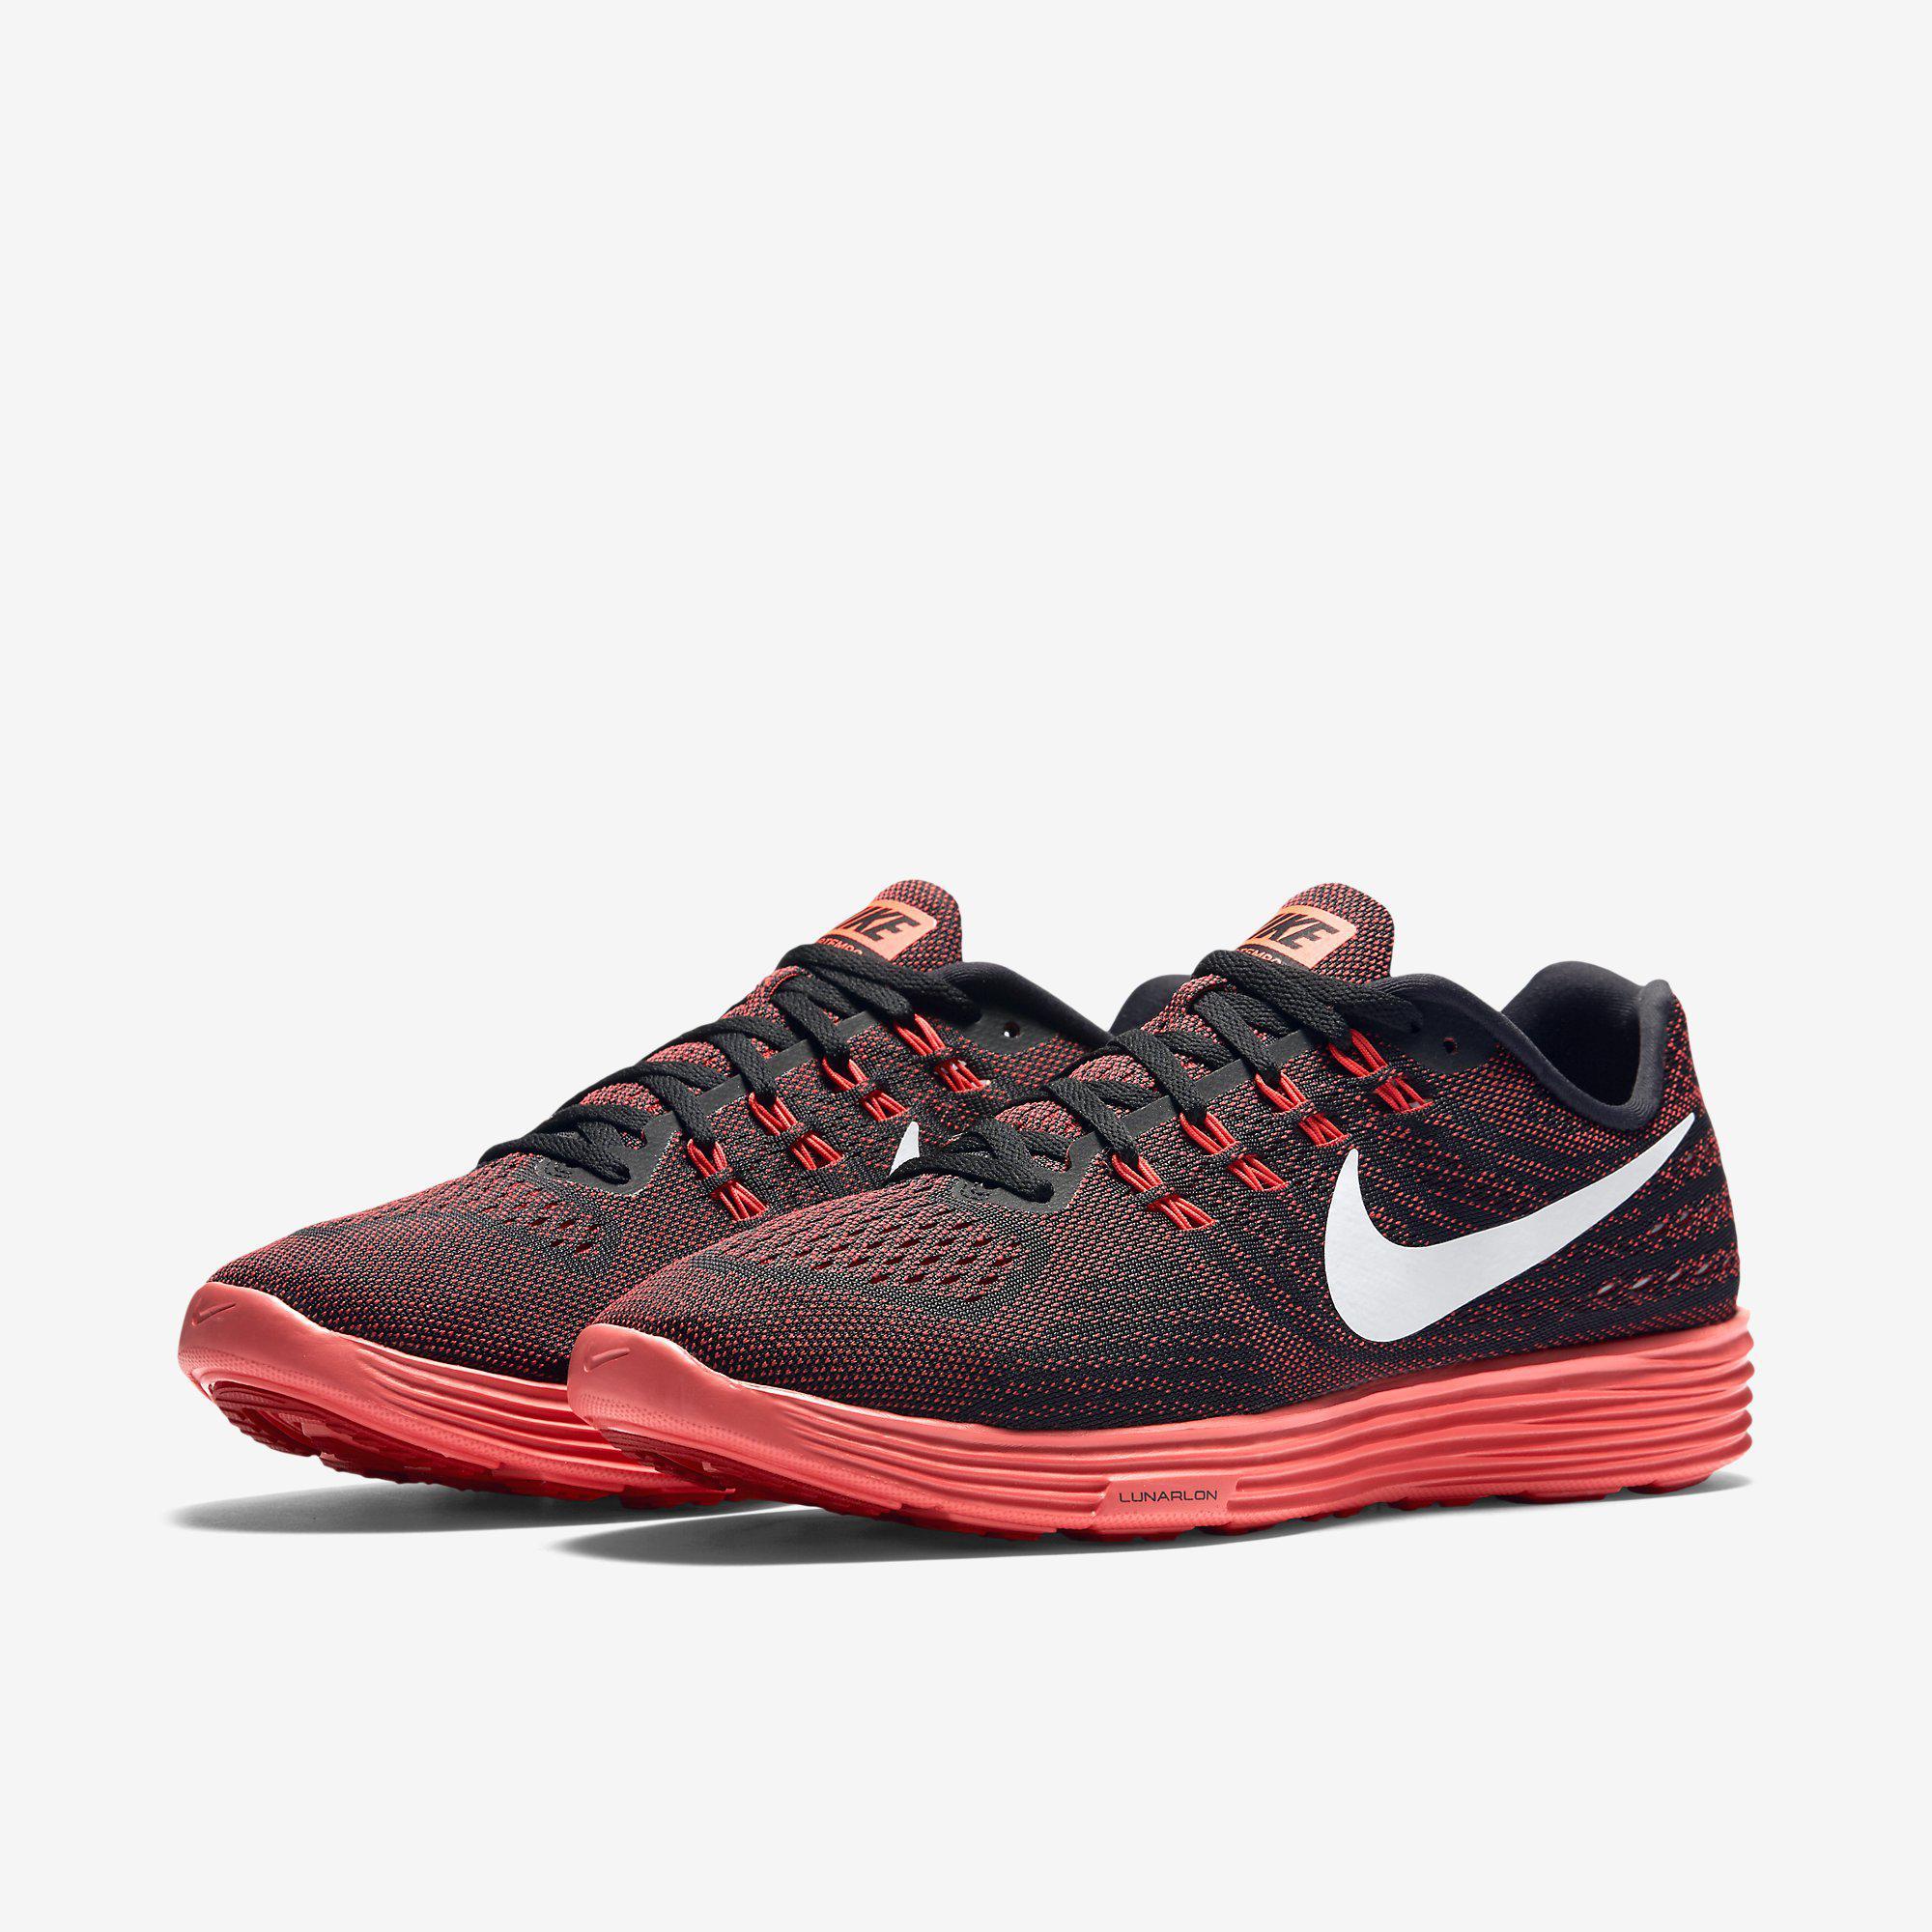 release date 25bec 381d6 Nike Mens LunarTempo 2 Running Shoes - RedBlack